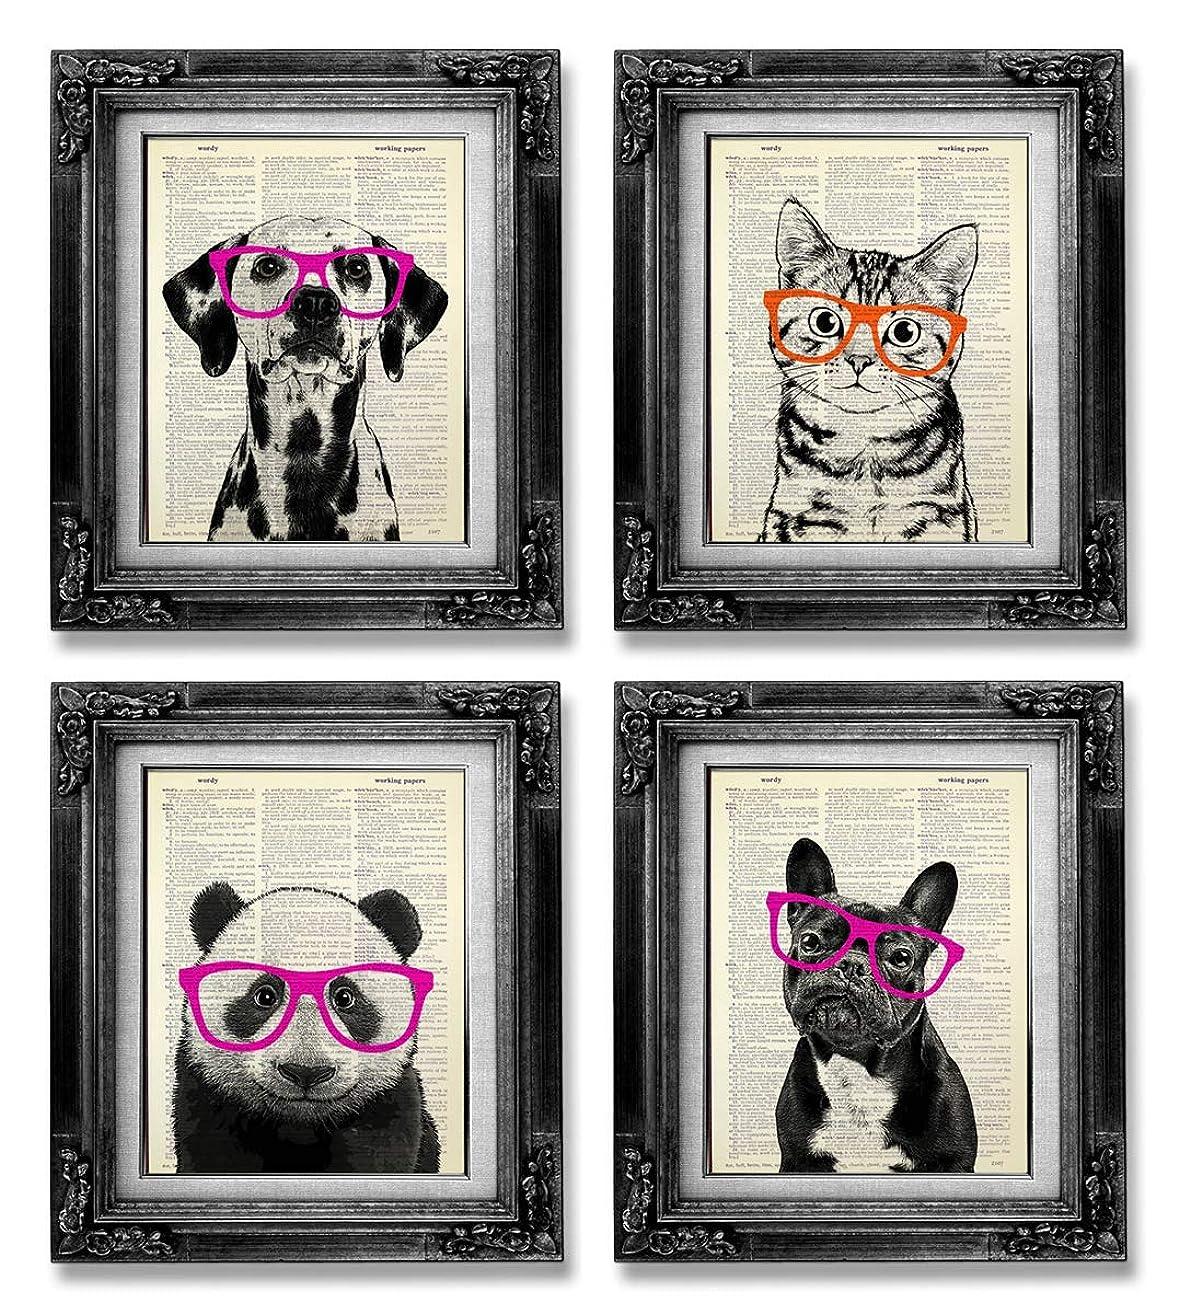 Animal with Glasses Poster Set of 4 Vintage Panda Dog Cat Dictionary Art Print, Funny Kids Room Wall Art, Whimsical Living Room Decor Gift Set, Humor Decoration